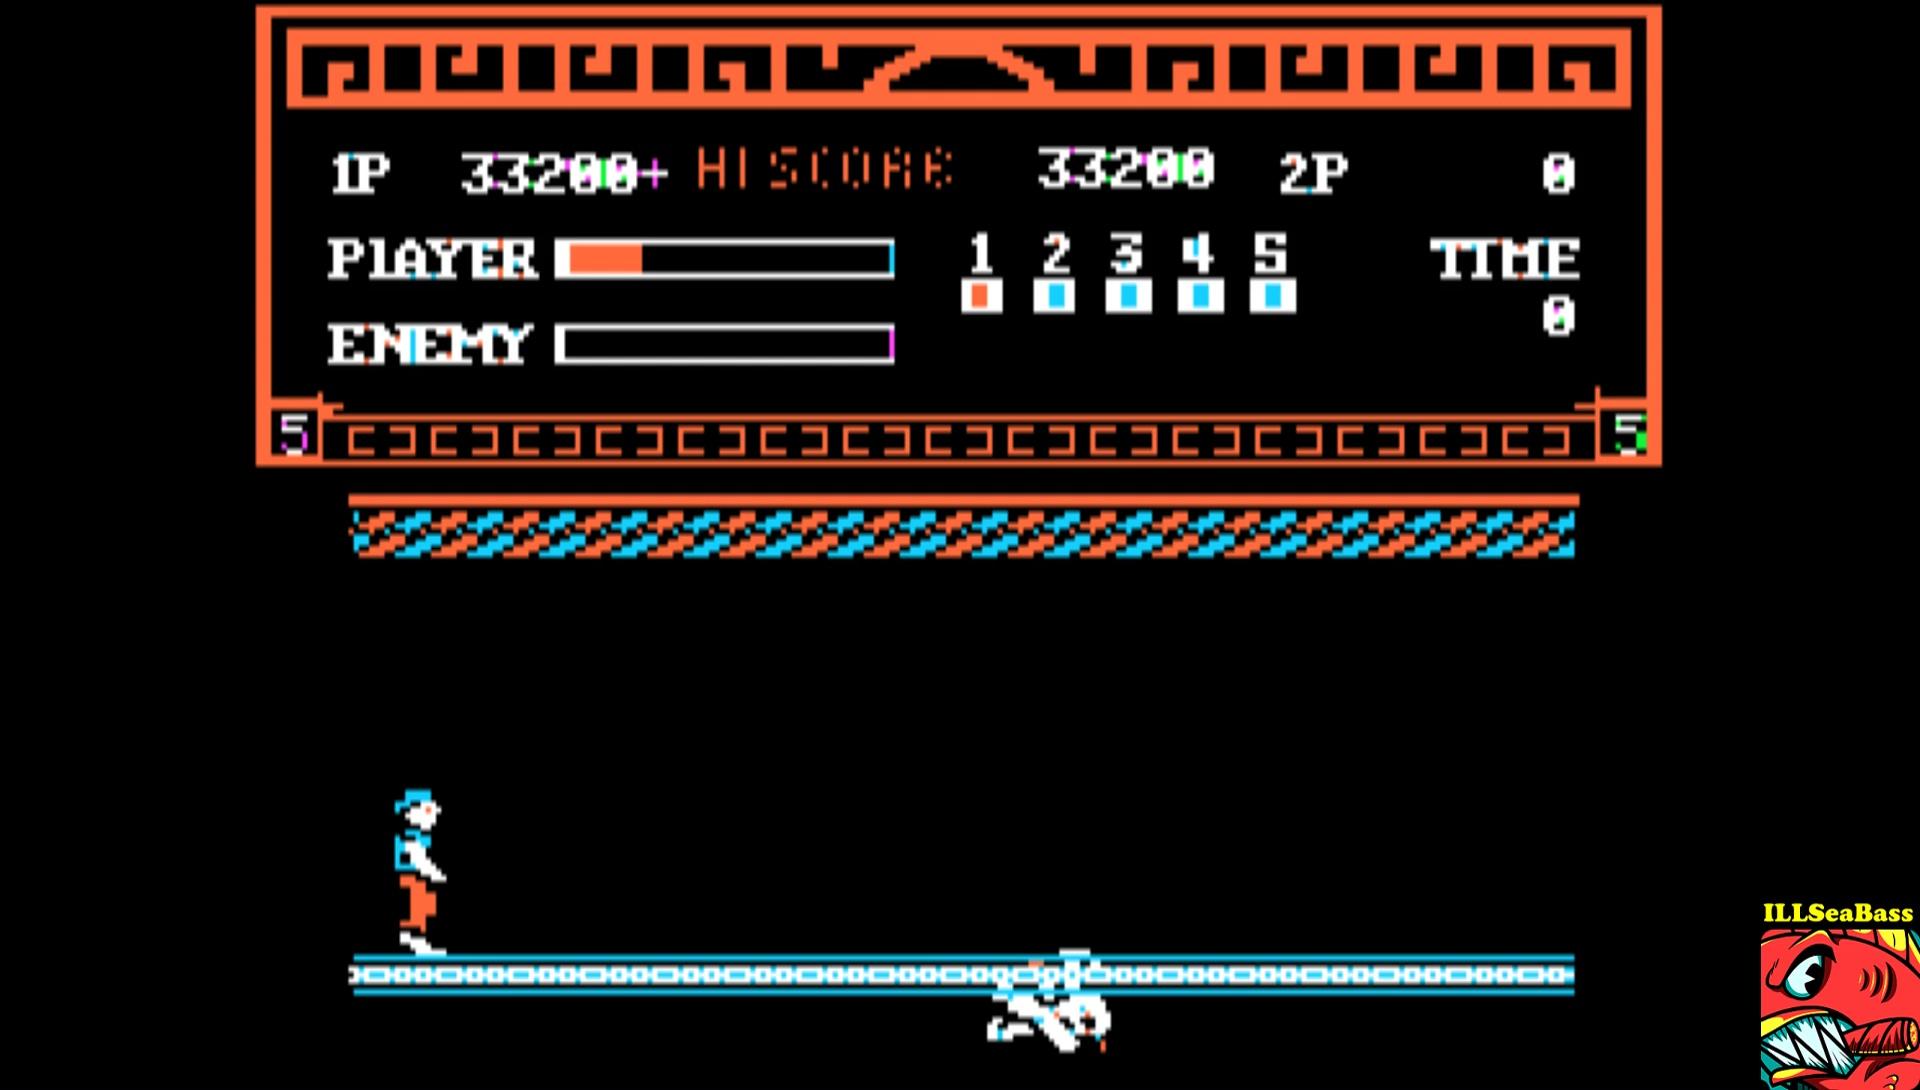 ILLSeaBass: Kung Fu Master (Apple II Emulated) 33,200 points on 2017-02-23 00:24:05